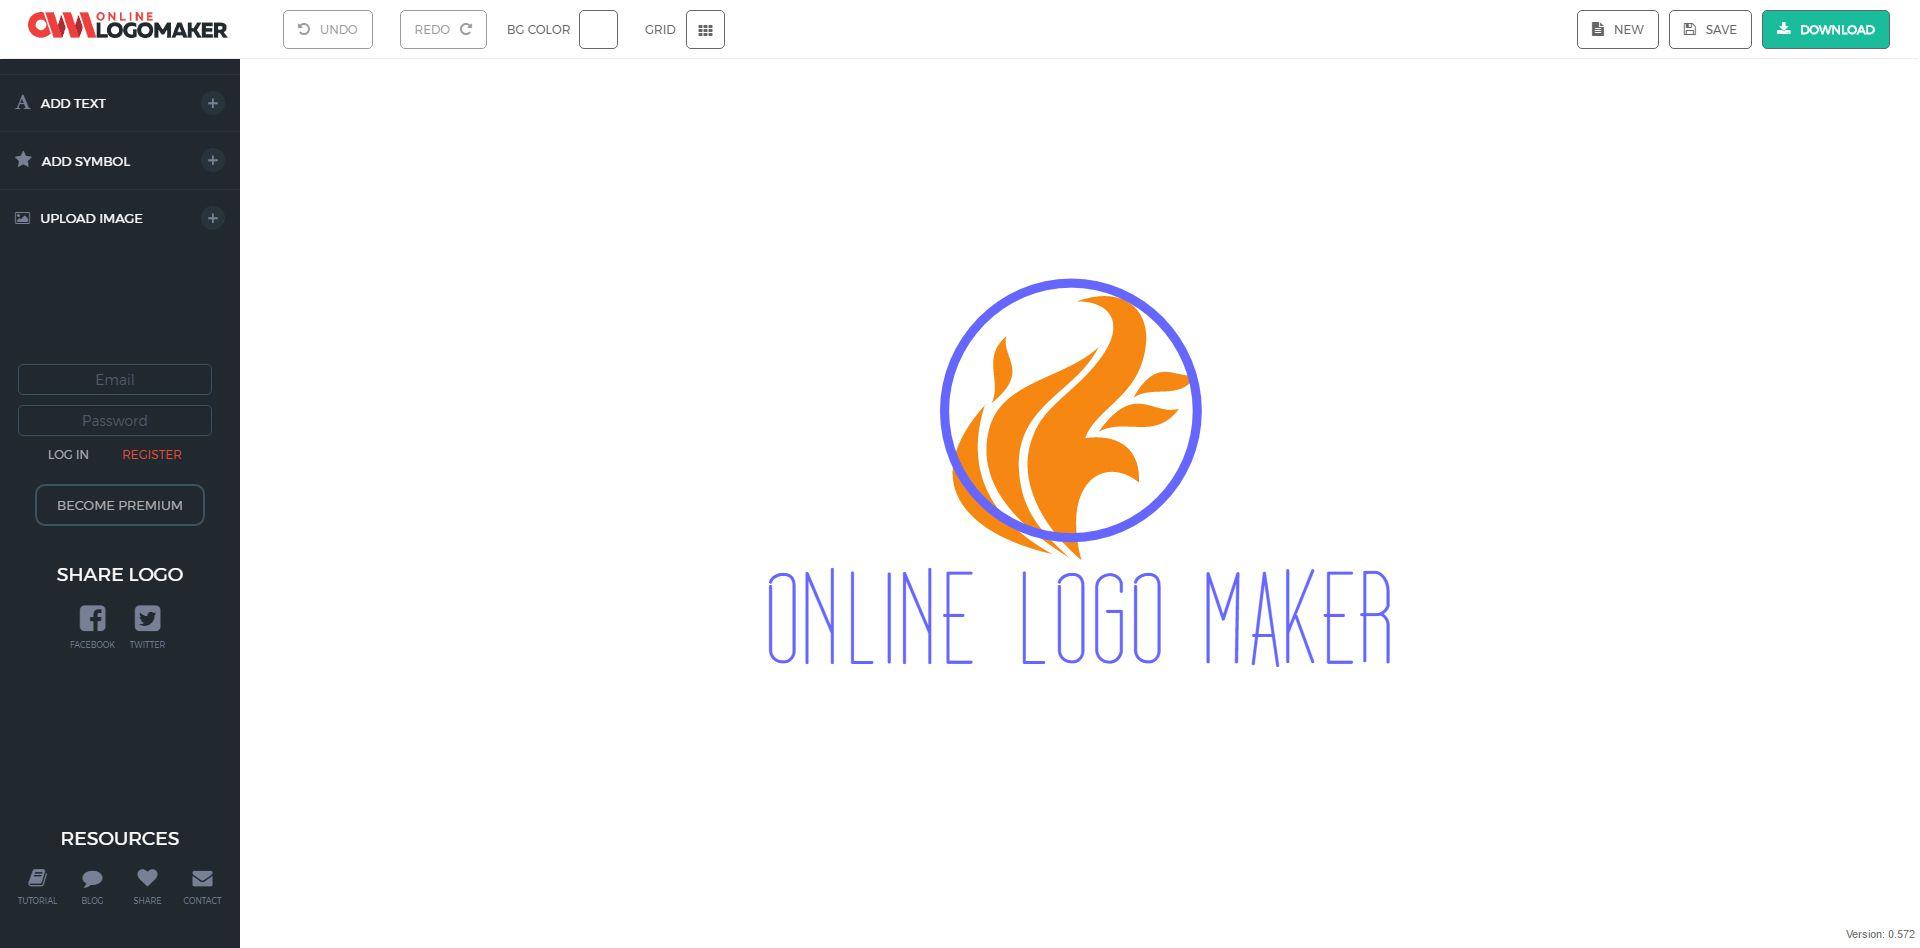 Screenshot of the Online Logo Maker workspace